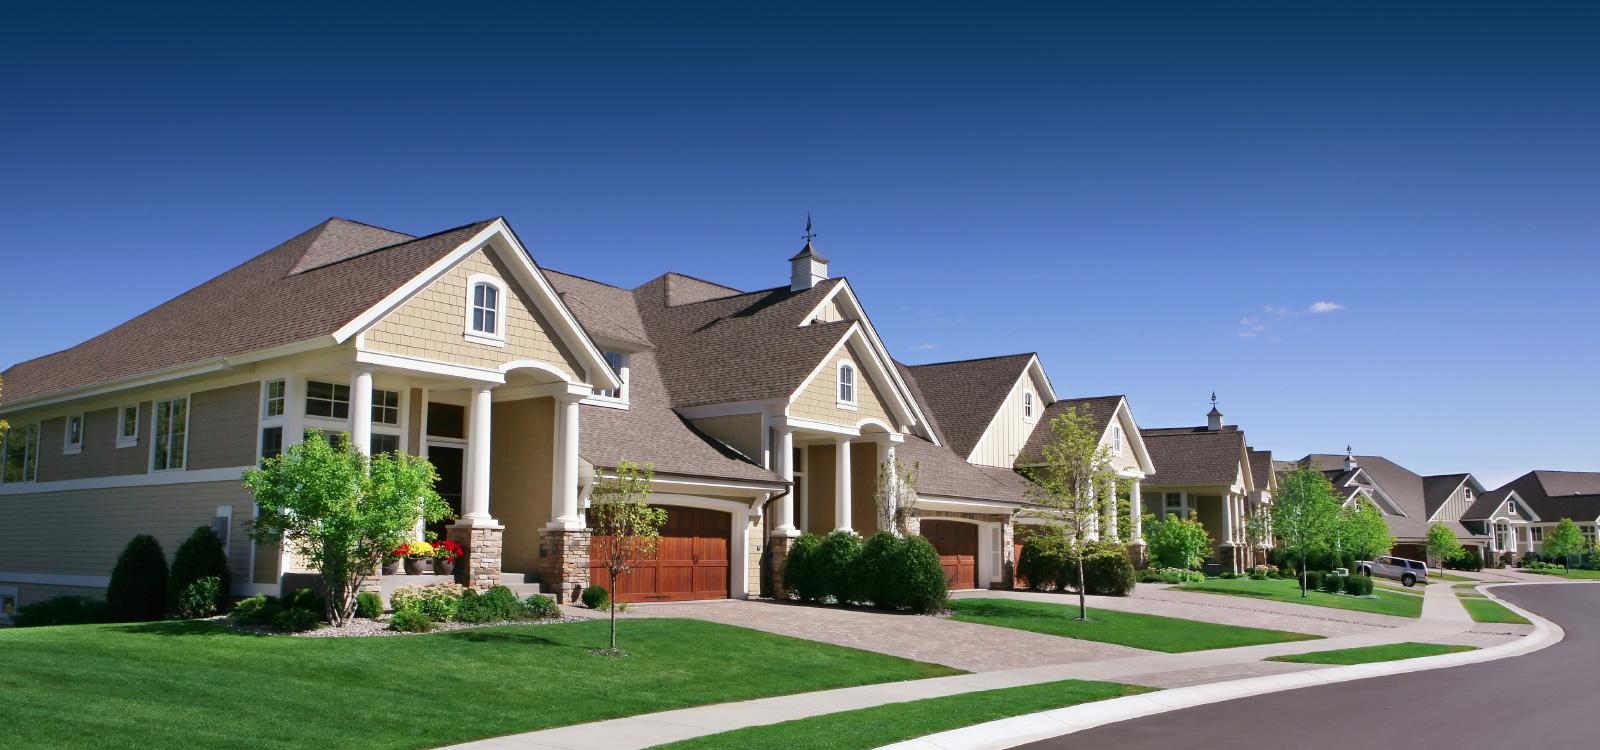 Home Inspection Checklist Wilmington